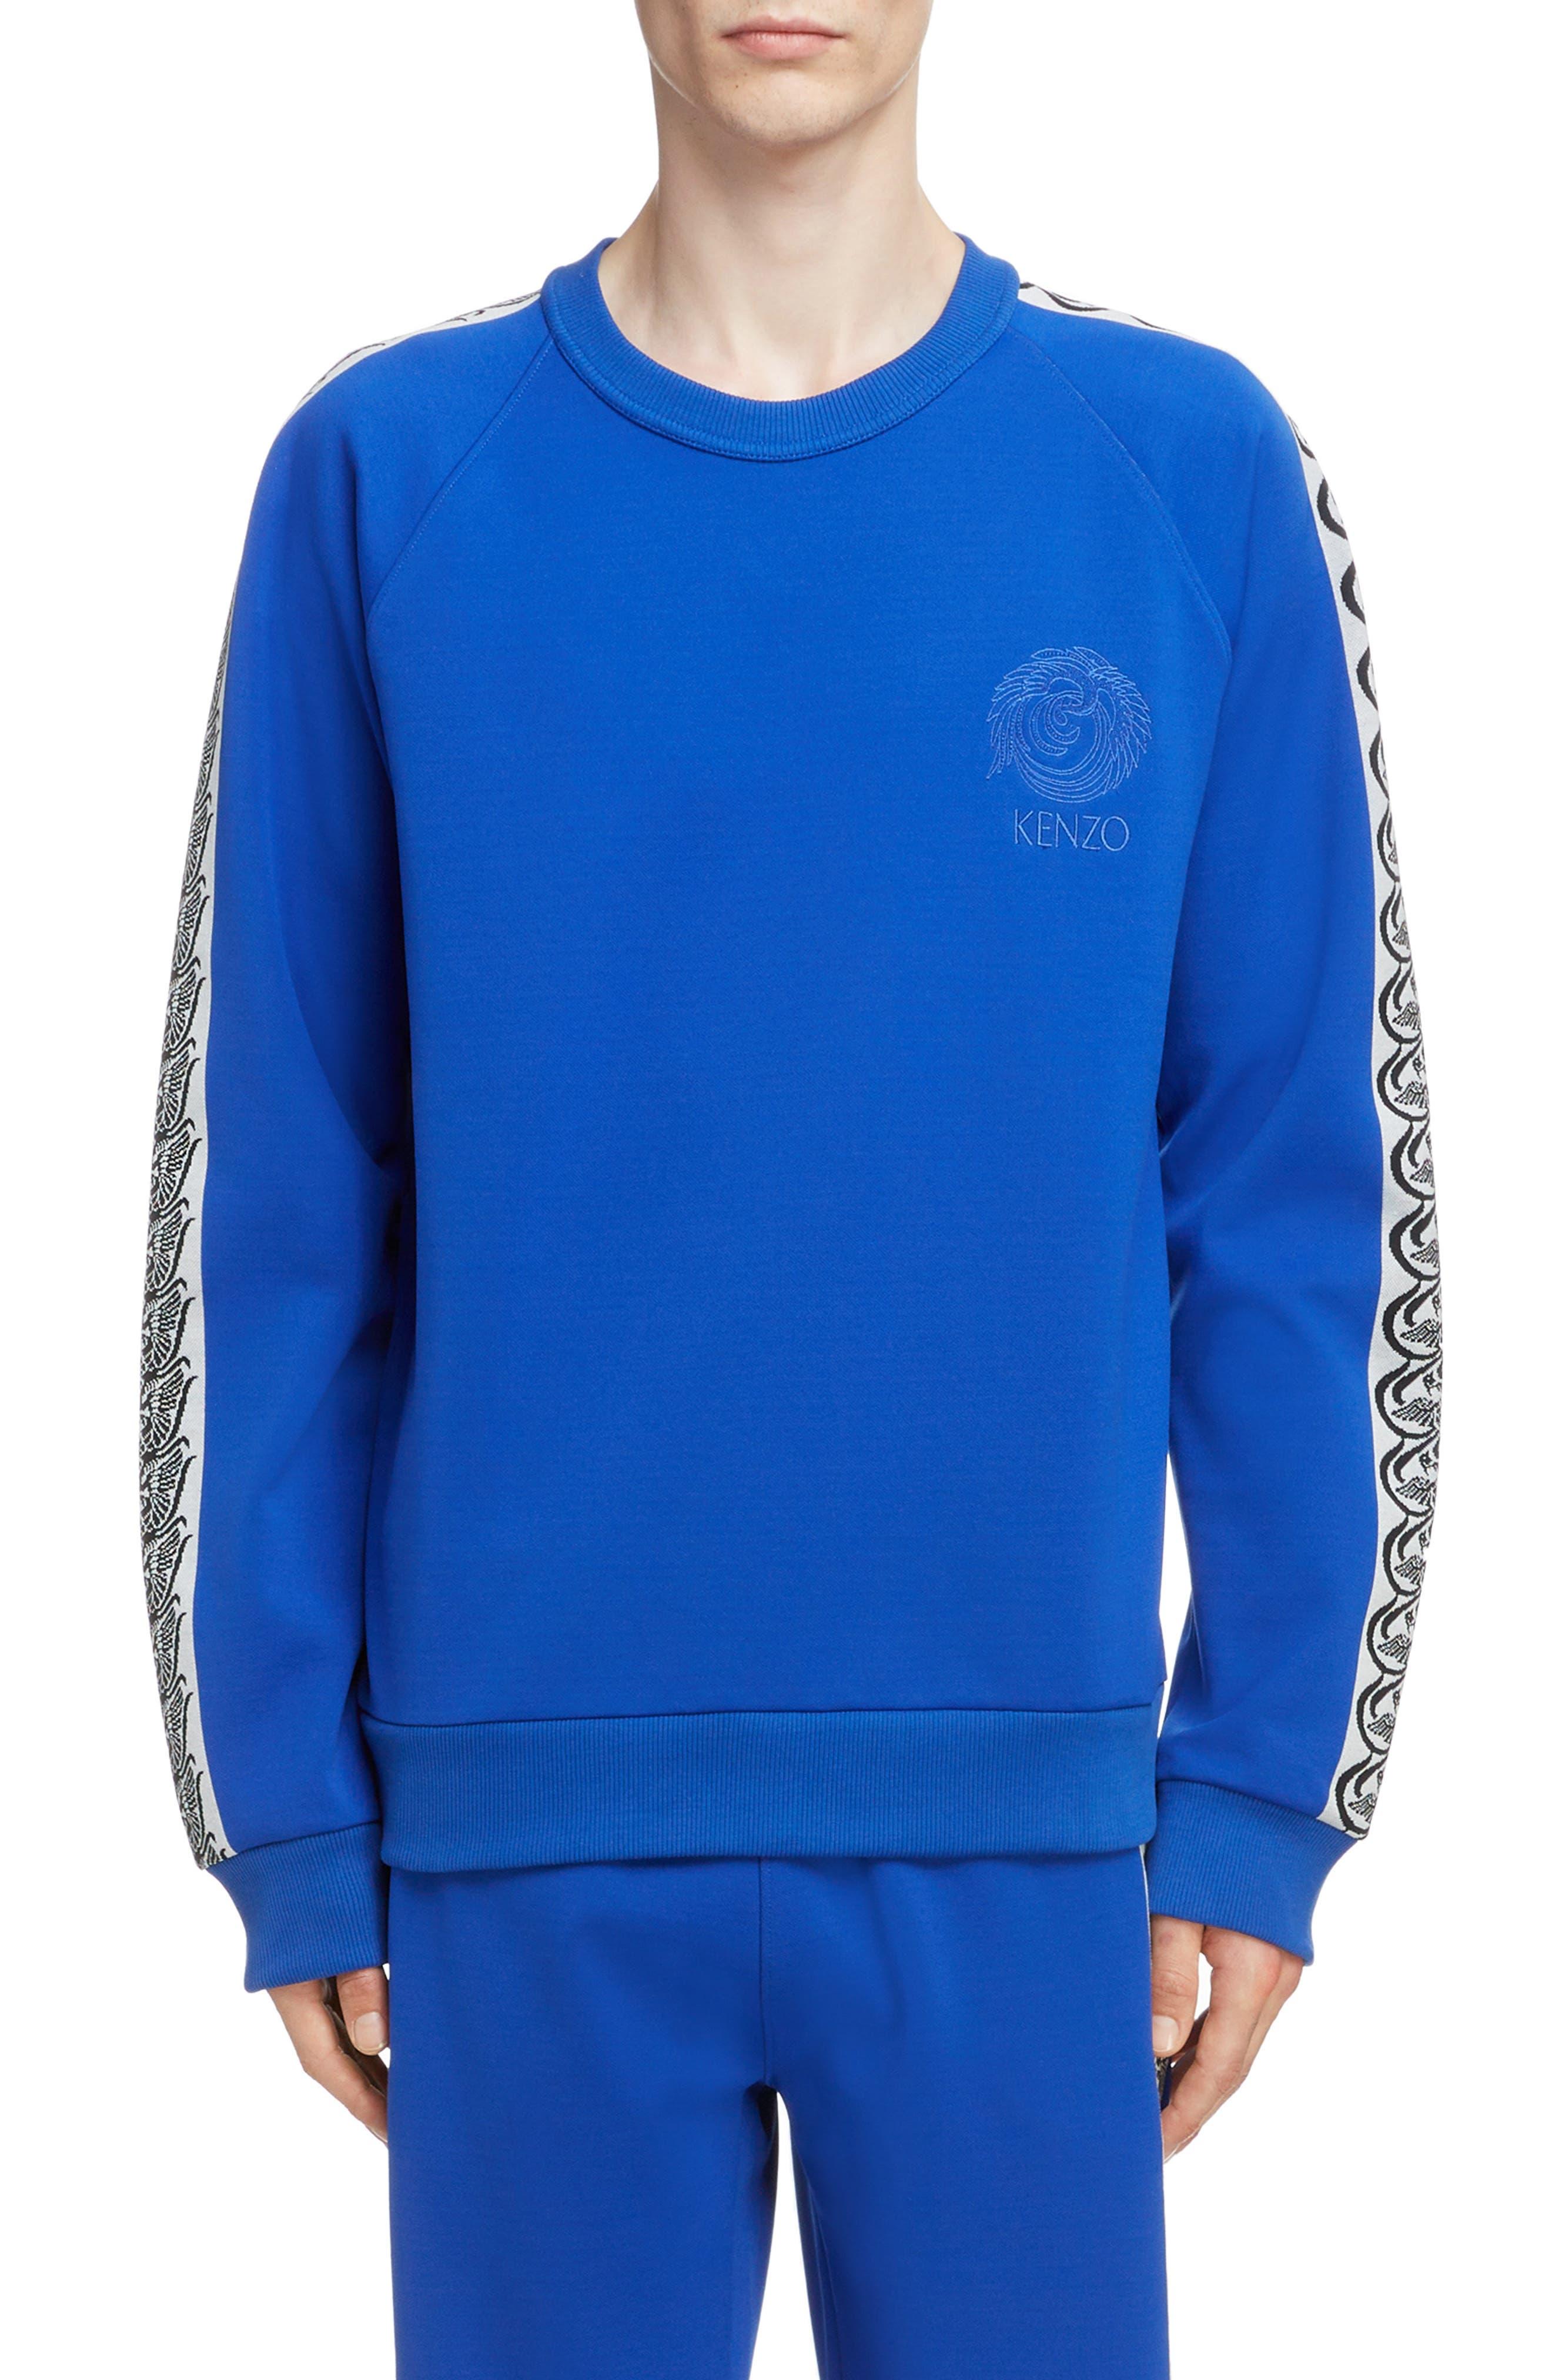 KENZO, Jacquard Raglan Sweatshirt, Main thumbnail 1, color, FRENCH BLUE